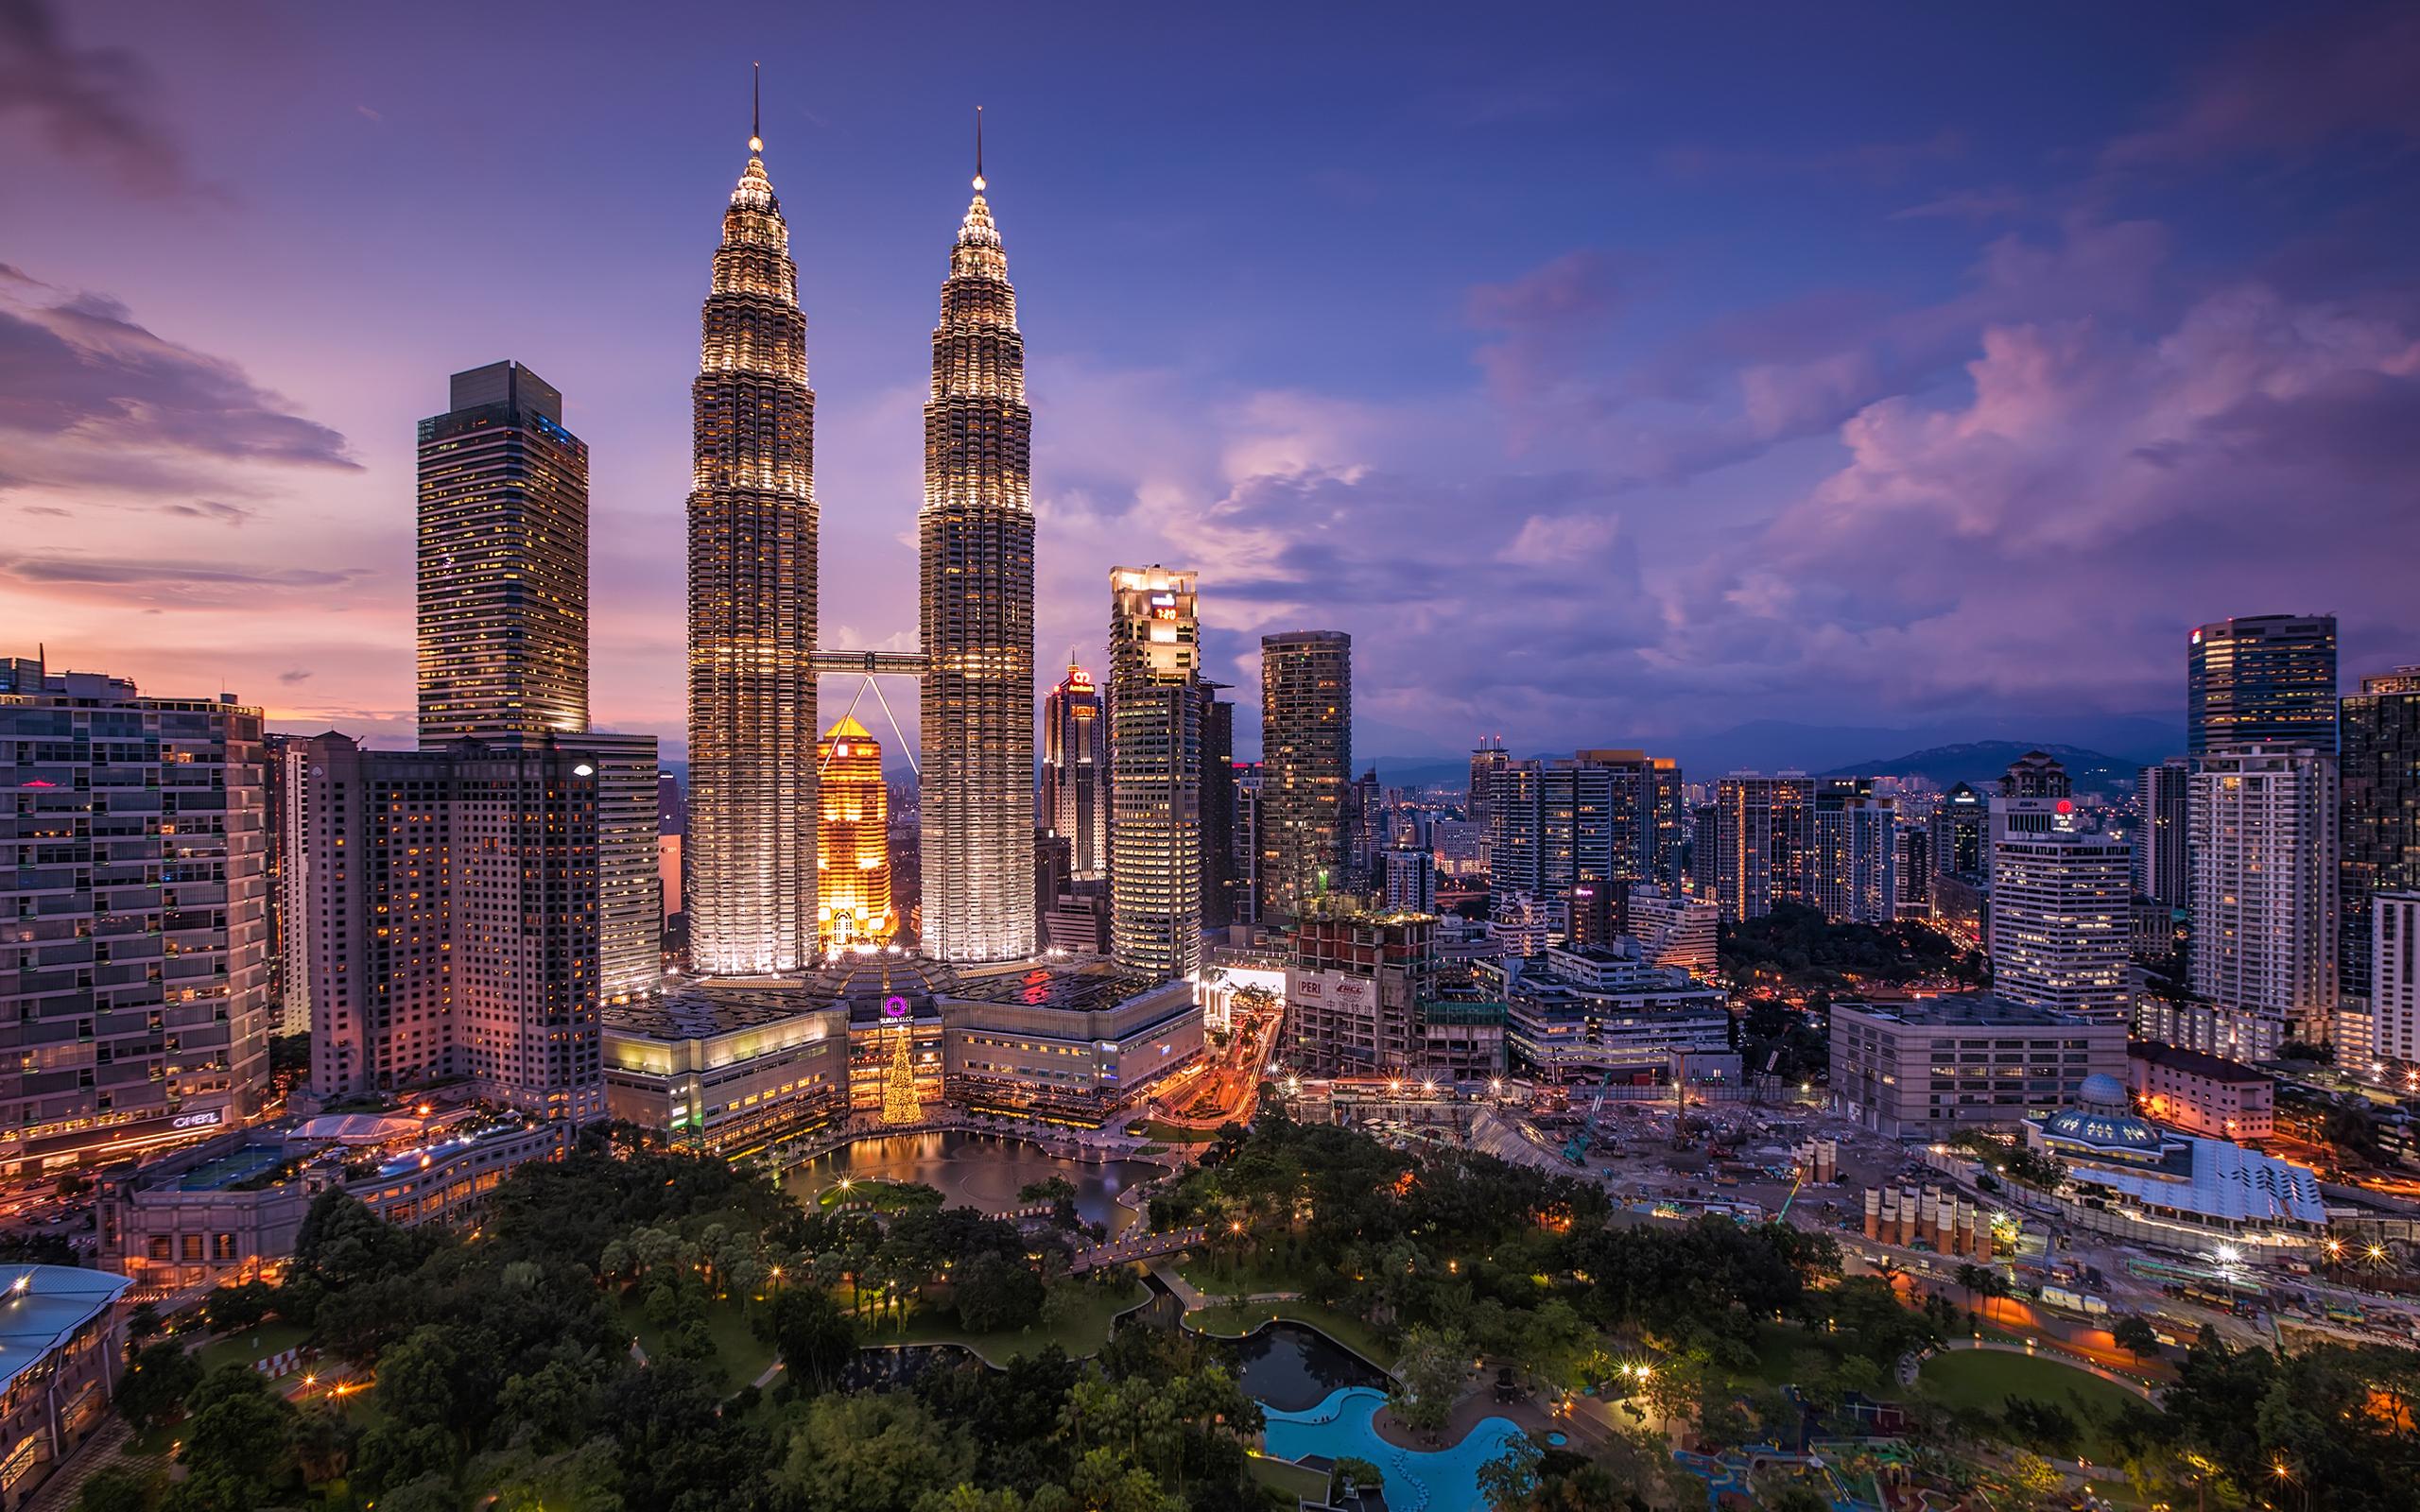 Highlights of Malaysia, Kuala Lumpur, Petronas towers